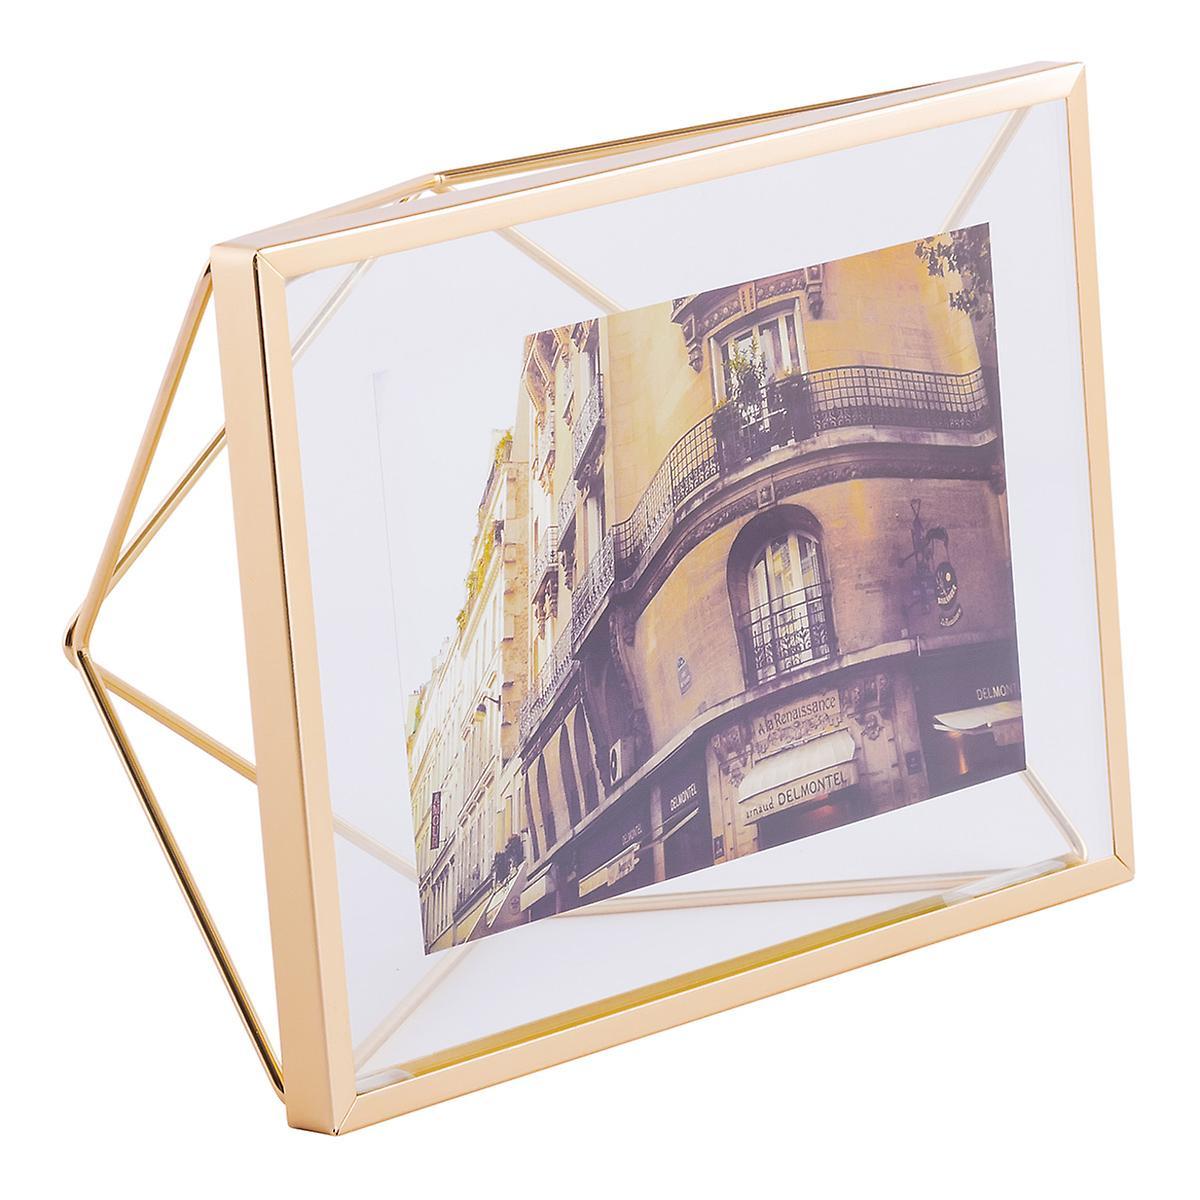 Umbra Prisma Photo Frames | The Container Store